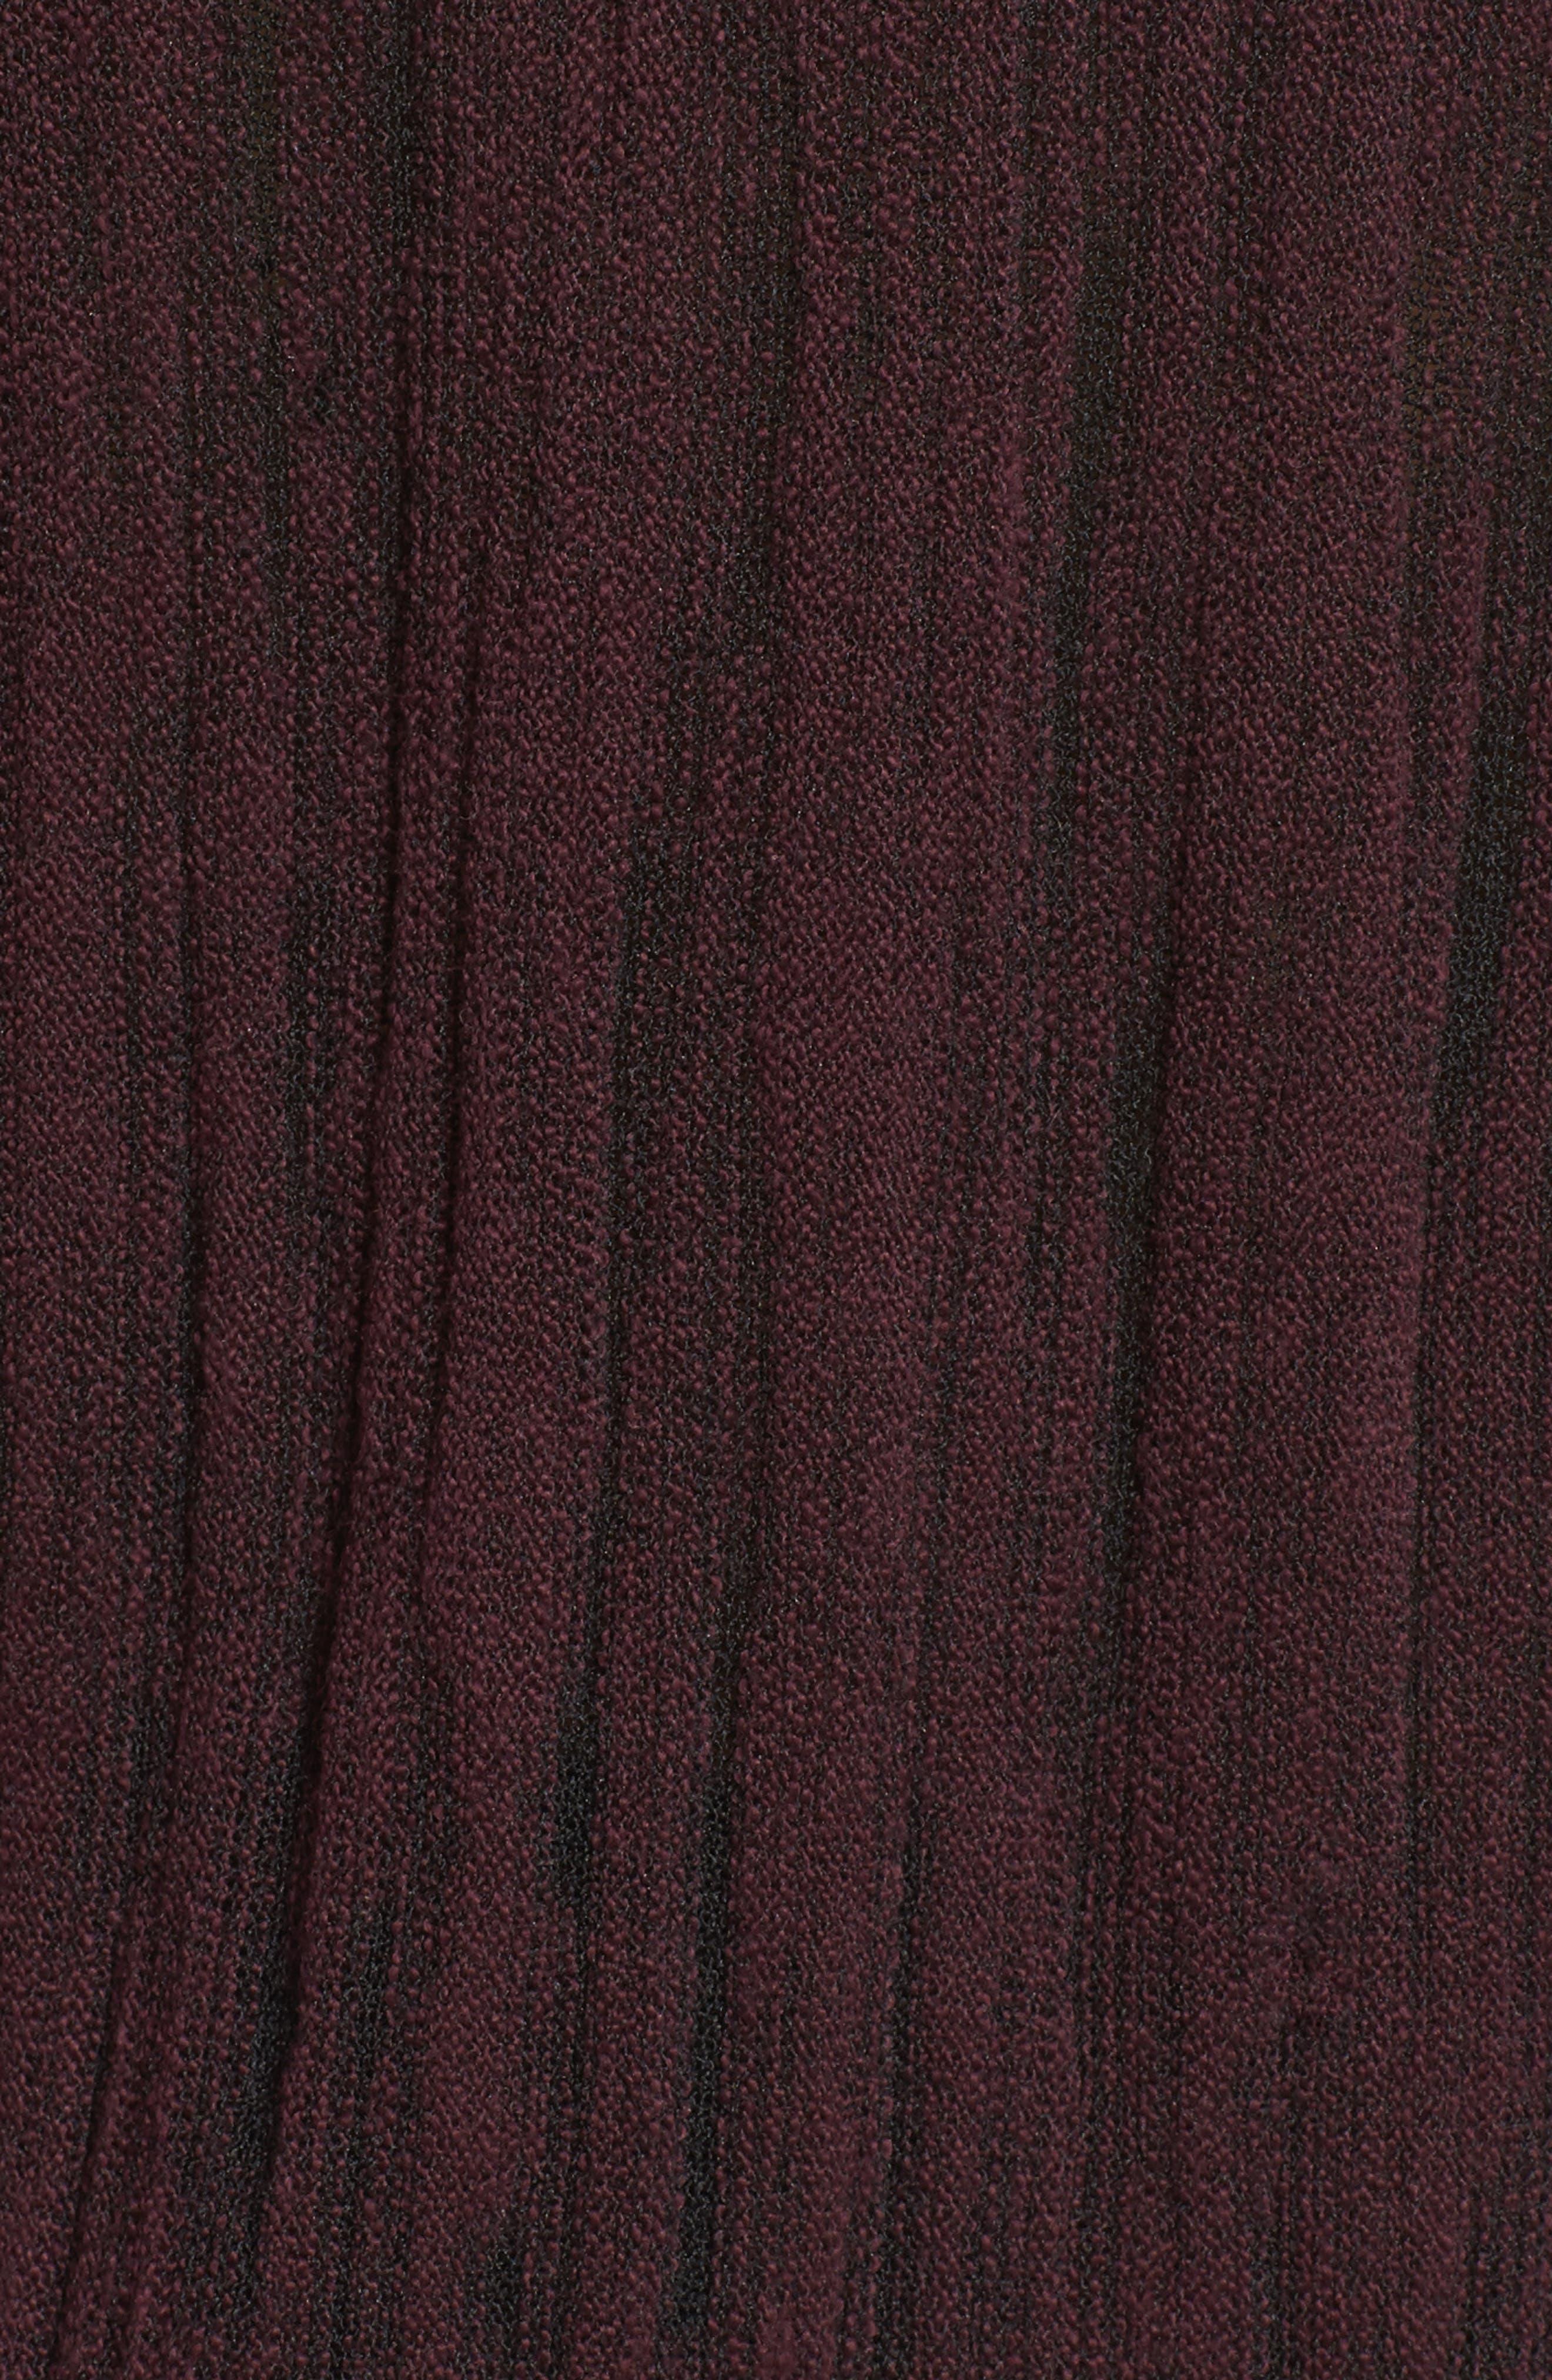 Cowl Neck Open Stitch Sweater,                             Alternate thumbnail 5, color,                             WINE